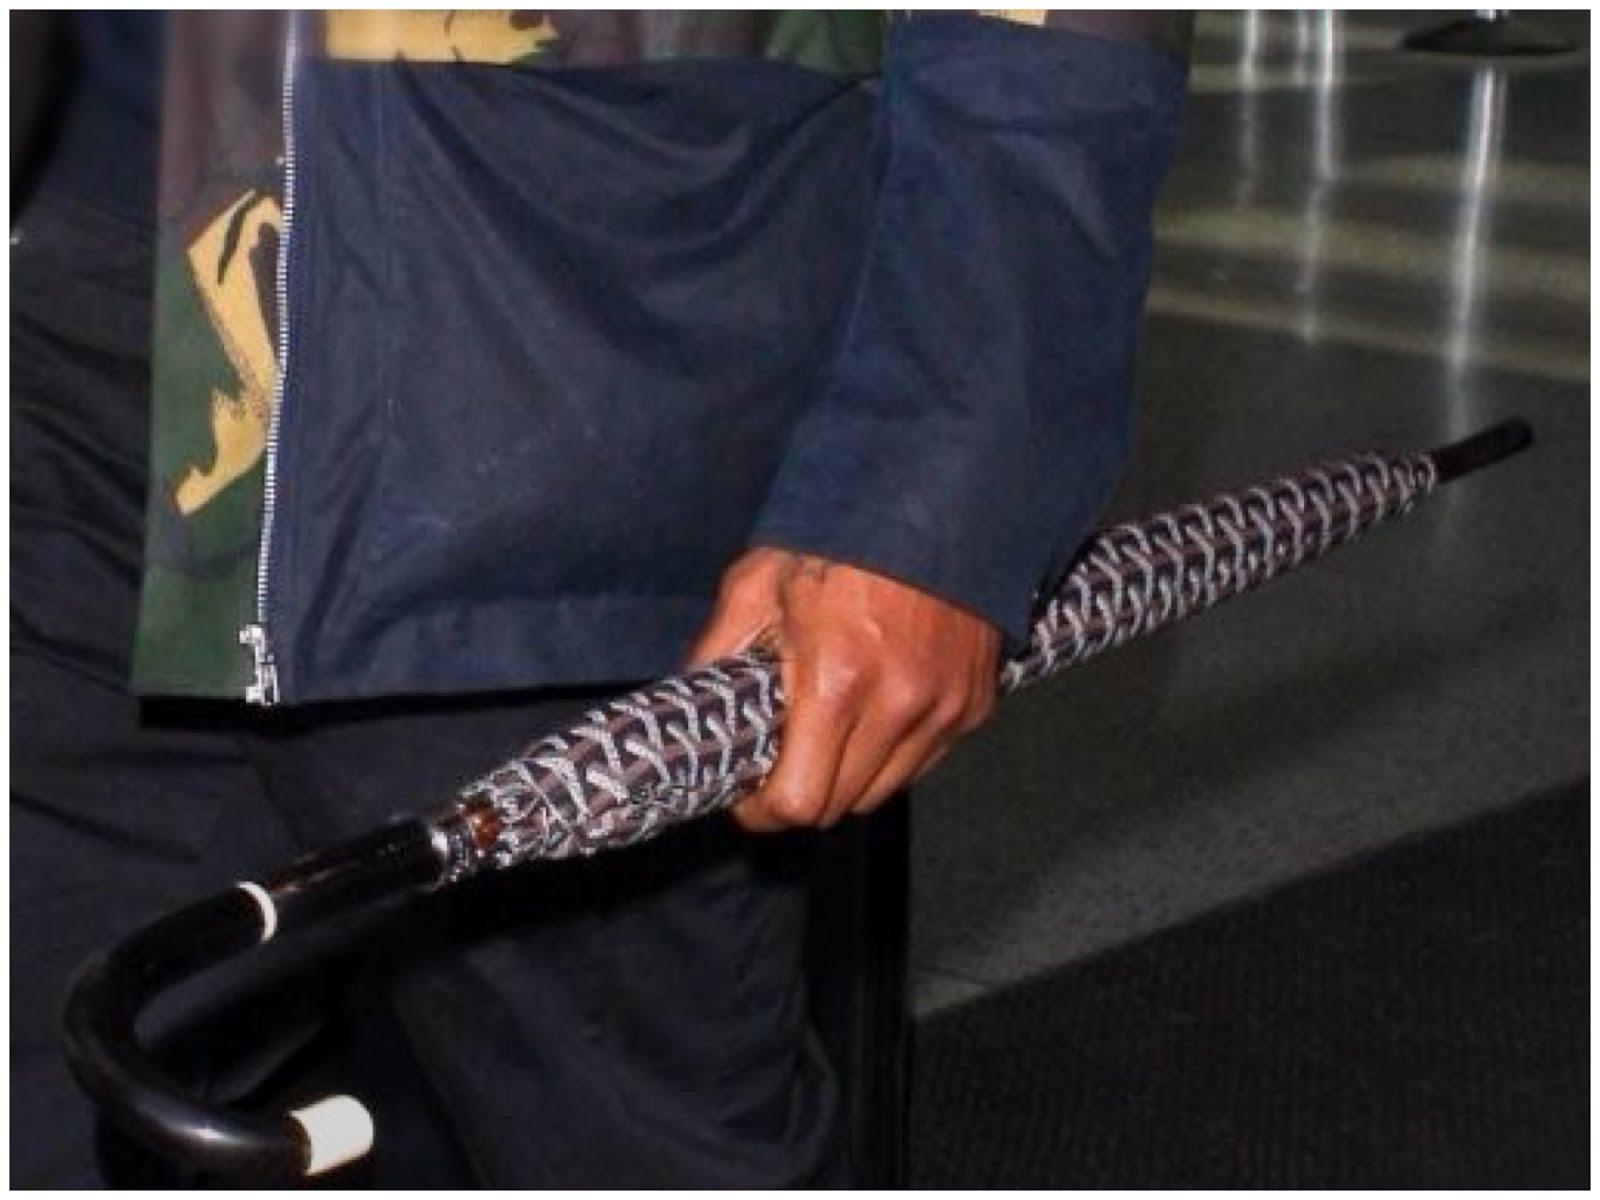 00O00 Menswear Blog Usher's Goyard umbrella - LAX Airport